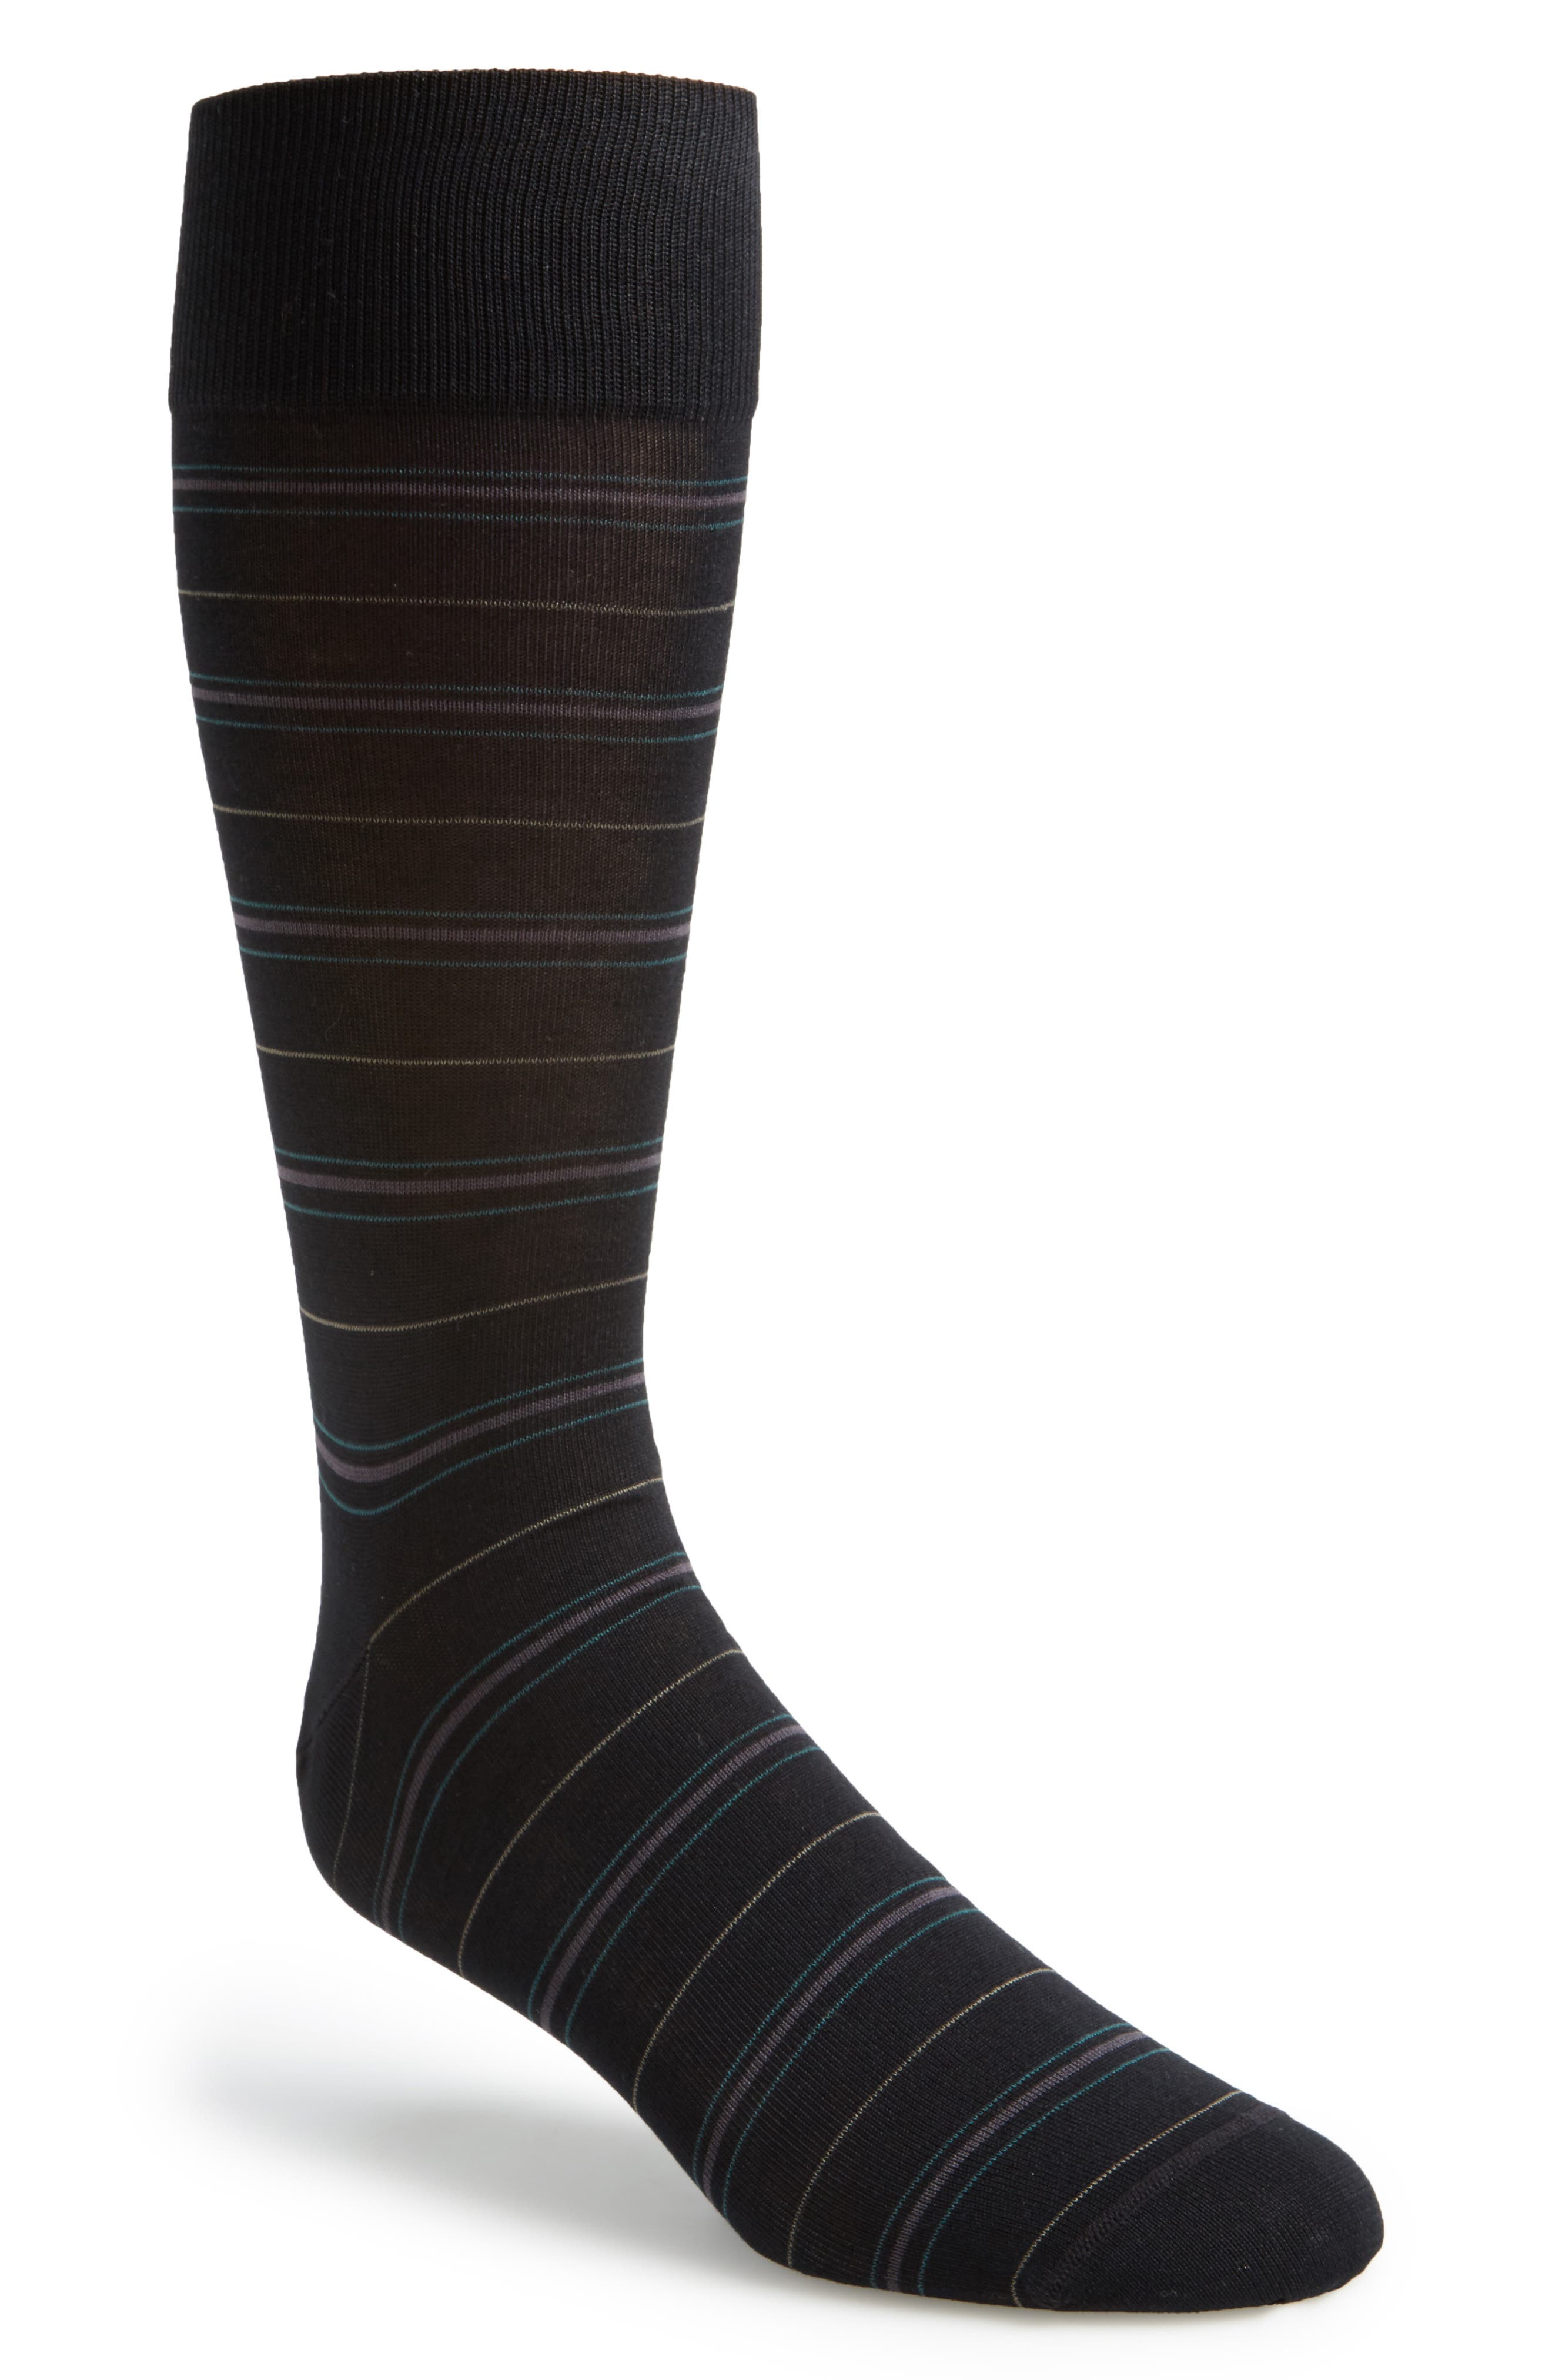 Interlines Socks,                         Main,                         color, 021